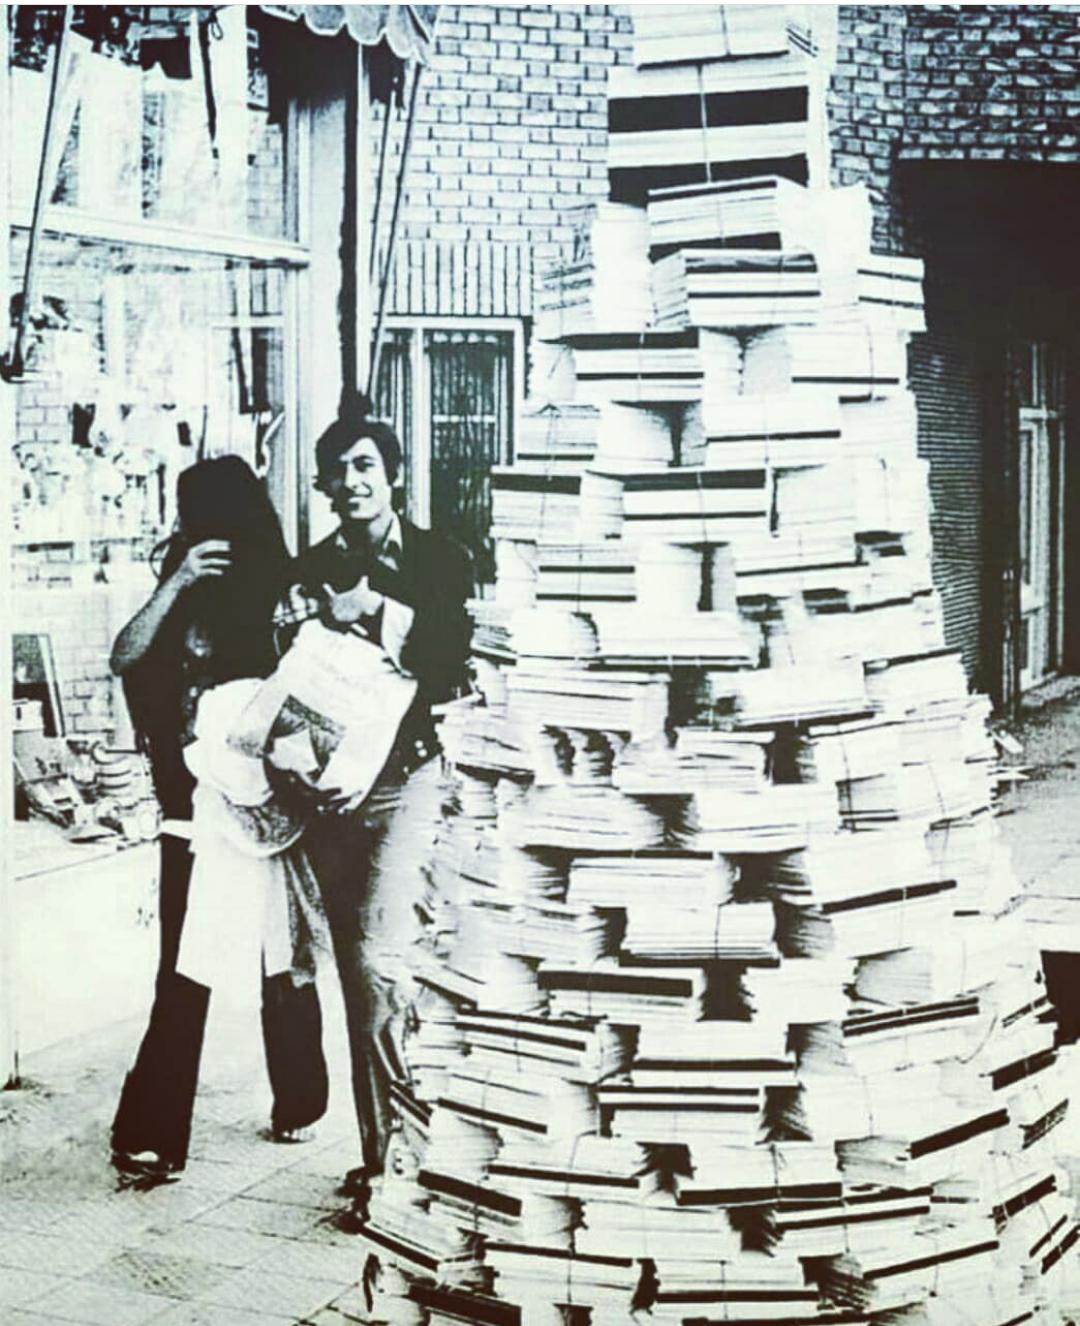 تهران قدیم سال ۵۶ عکس